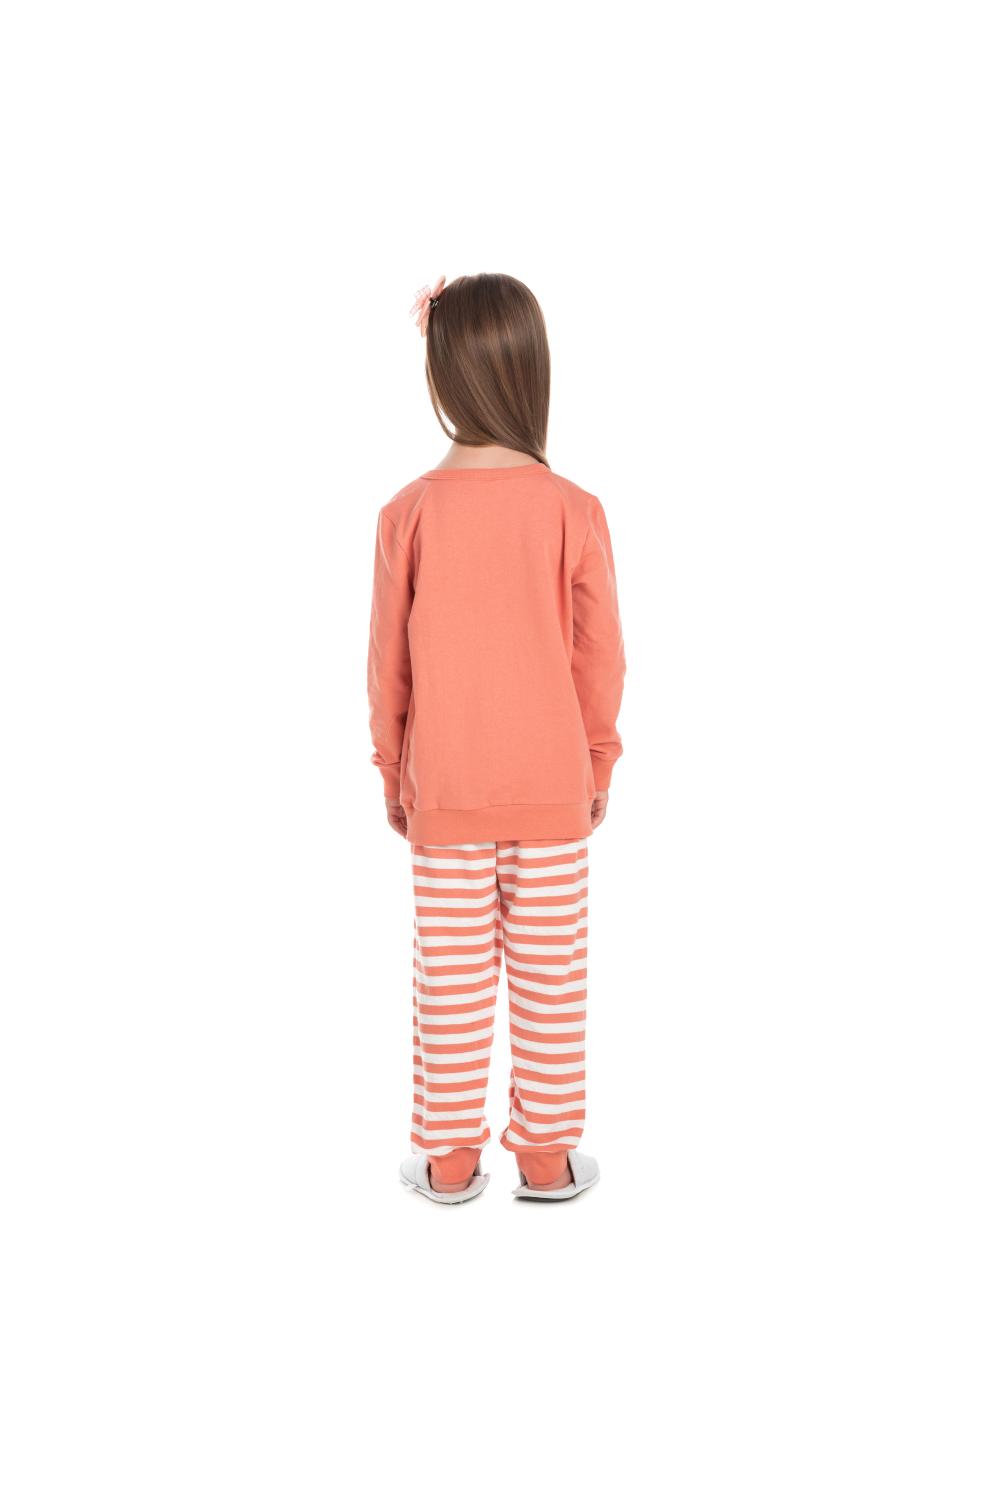 220/B - Pijama Infantil Feminino Cool Bear